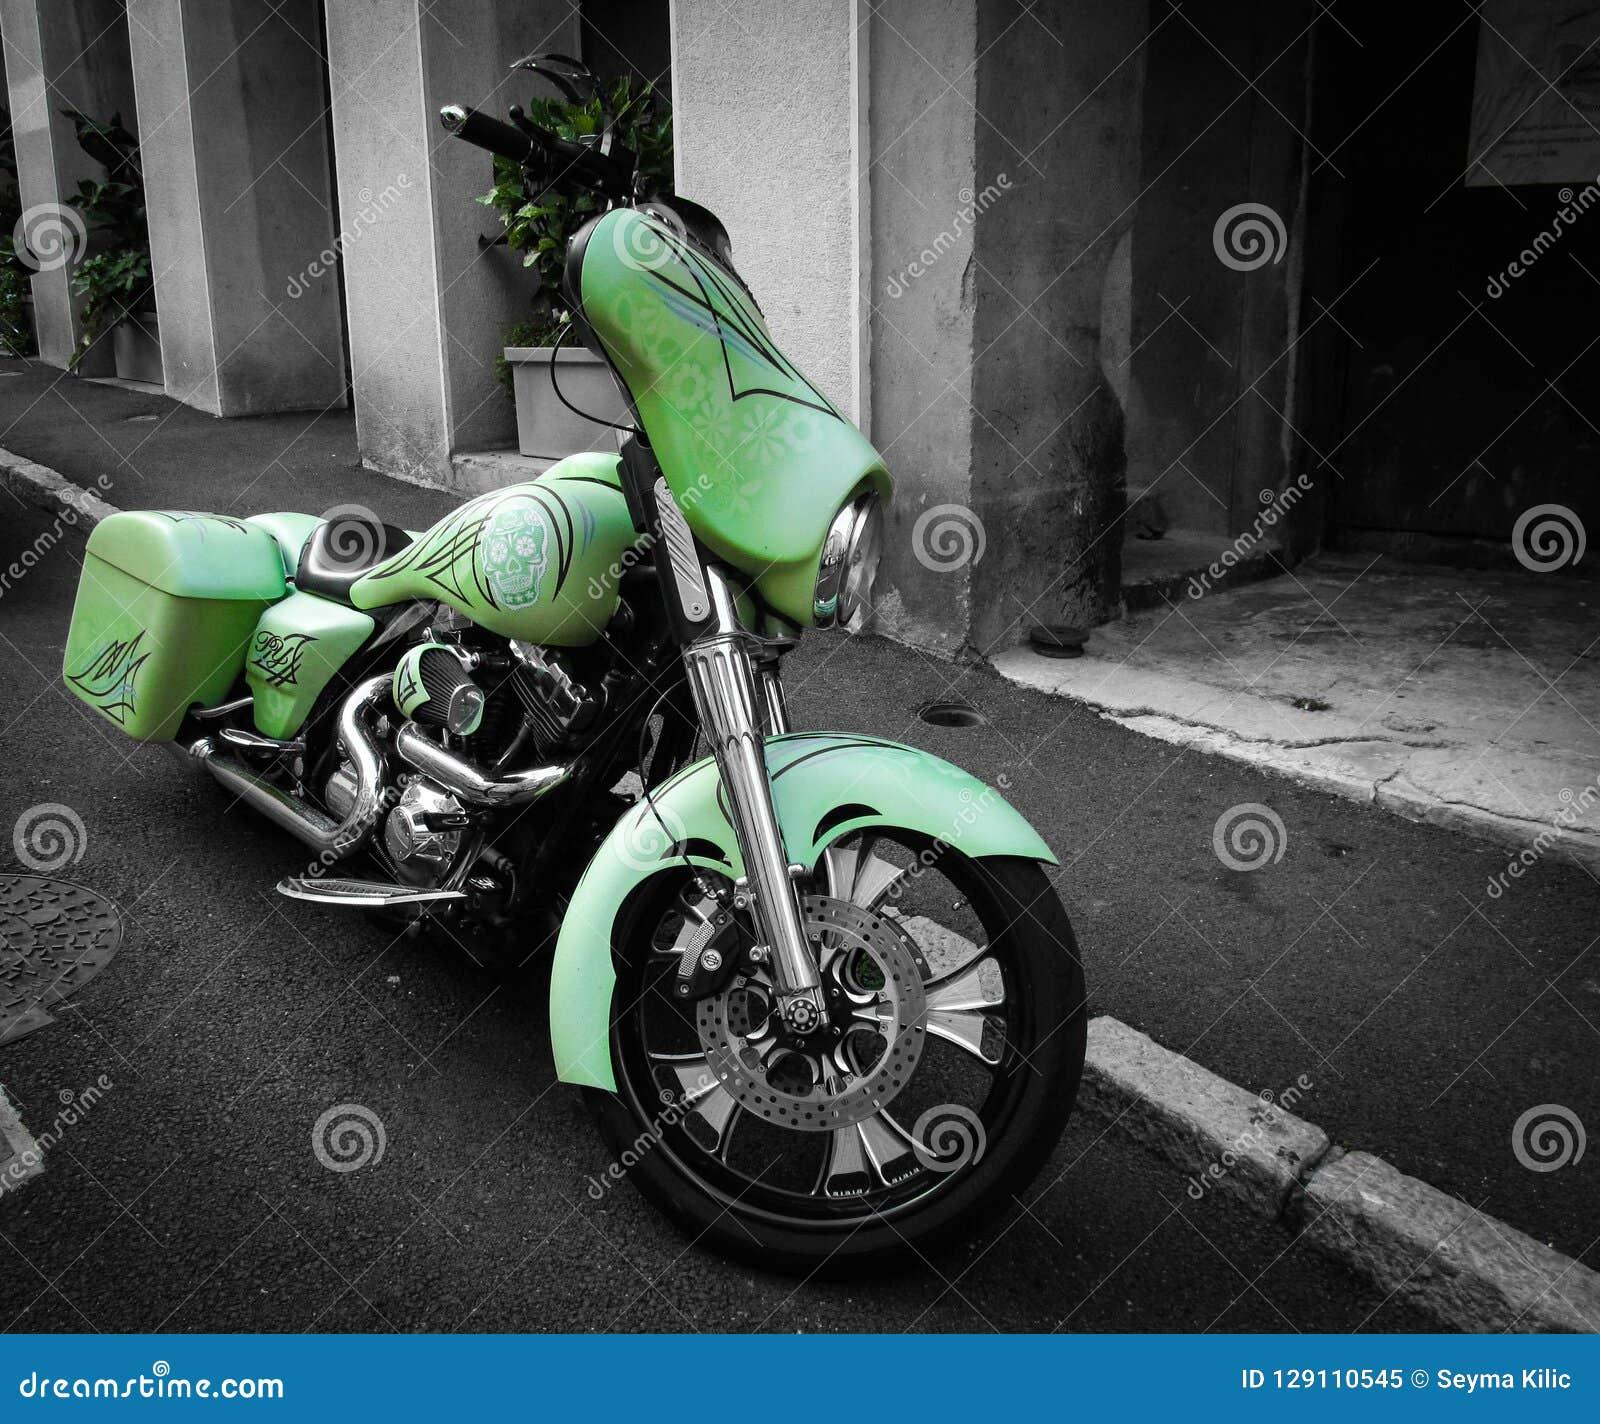 Moto verde en calle negra y blanca